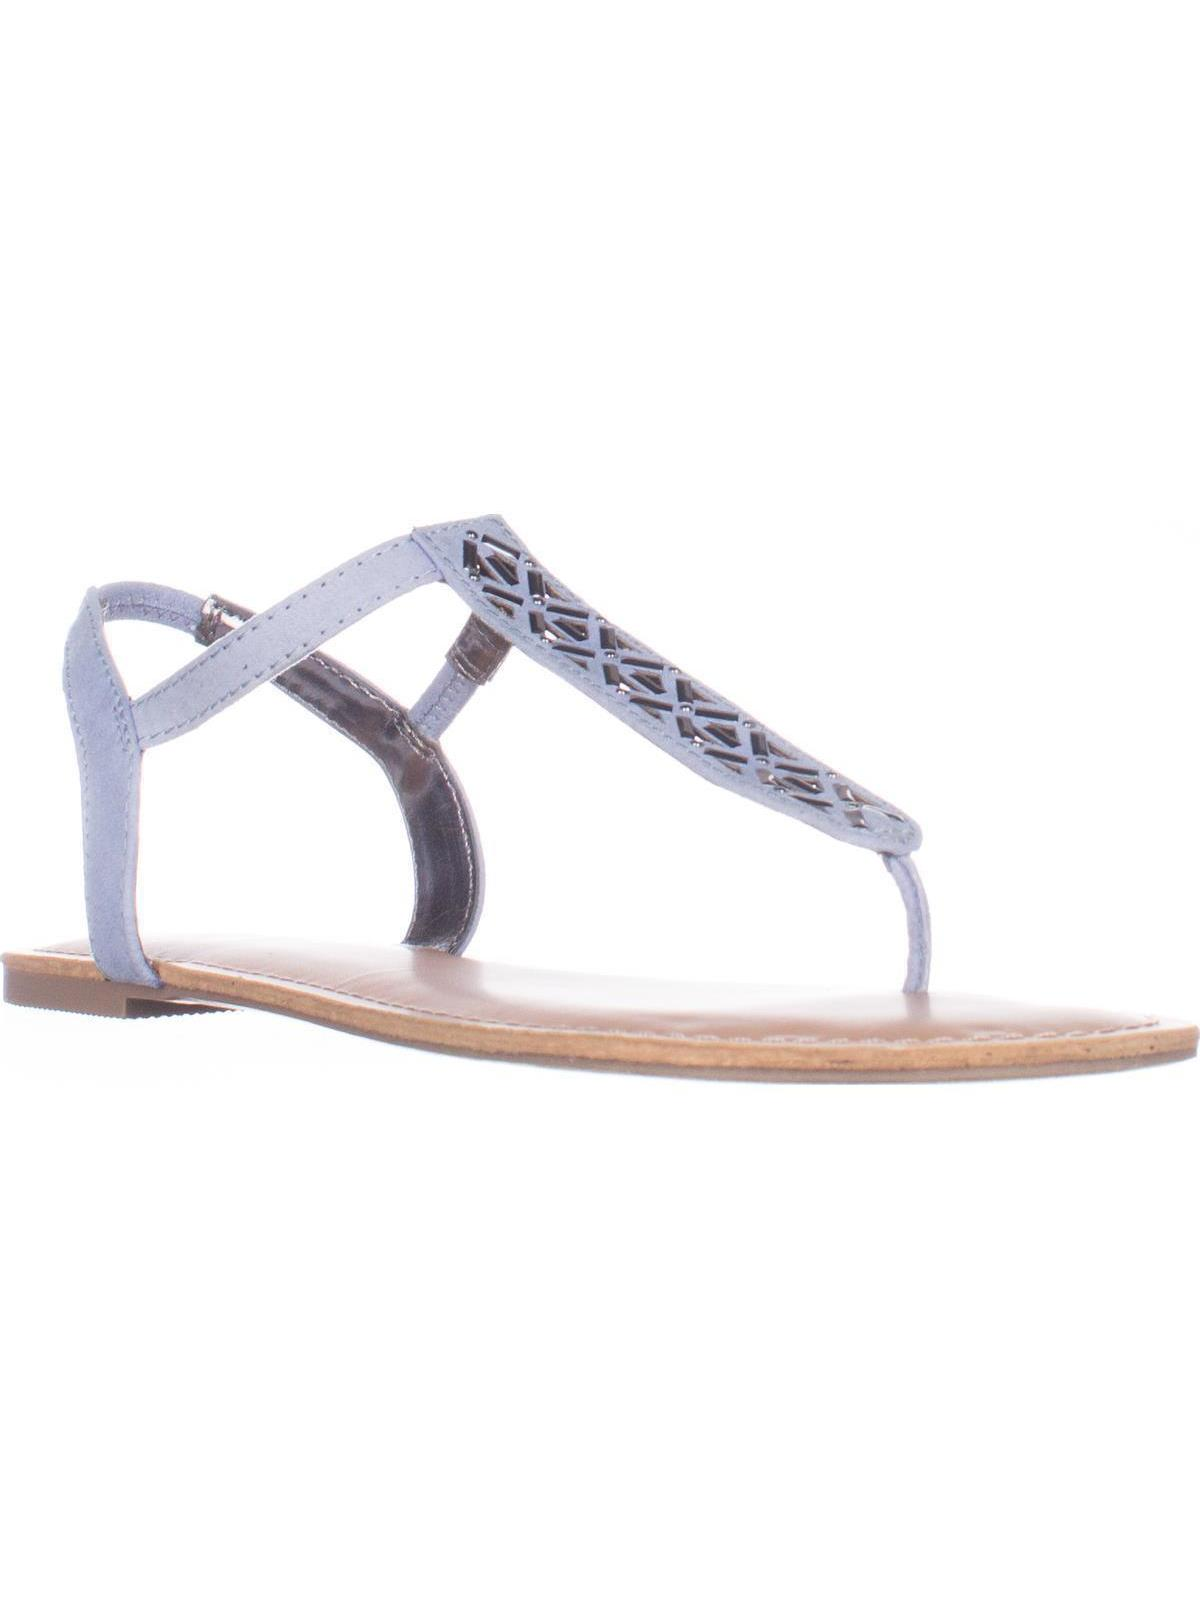 608238027 MG35 Skyler Flat T-Strap Thong Sandals